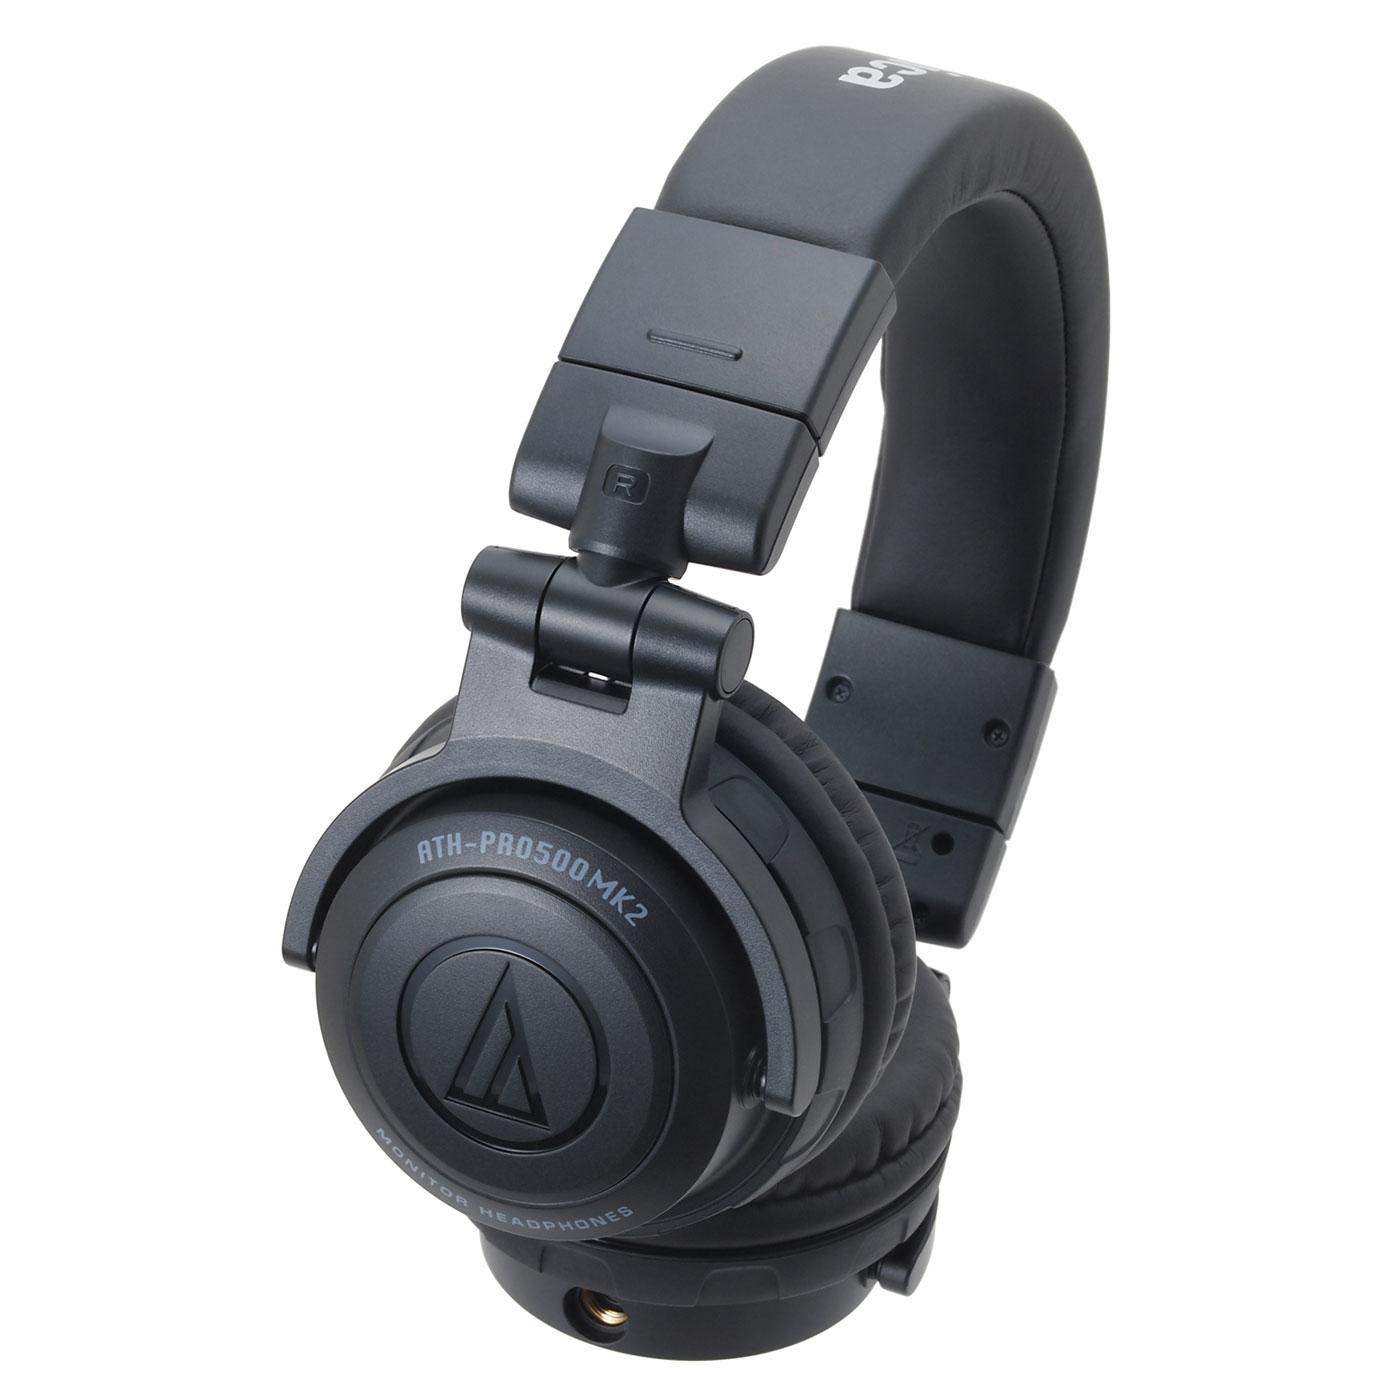 audio technica ath pro500mk2 noir casque audio technica sur ldlc com